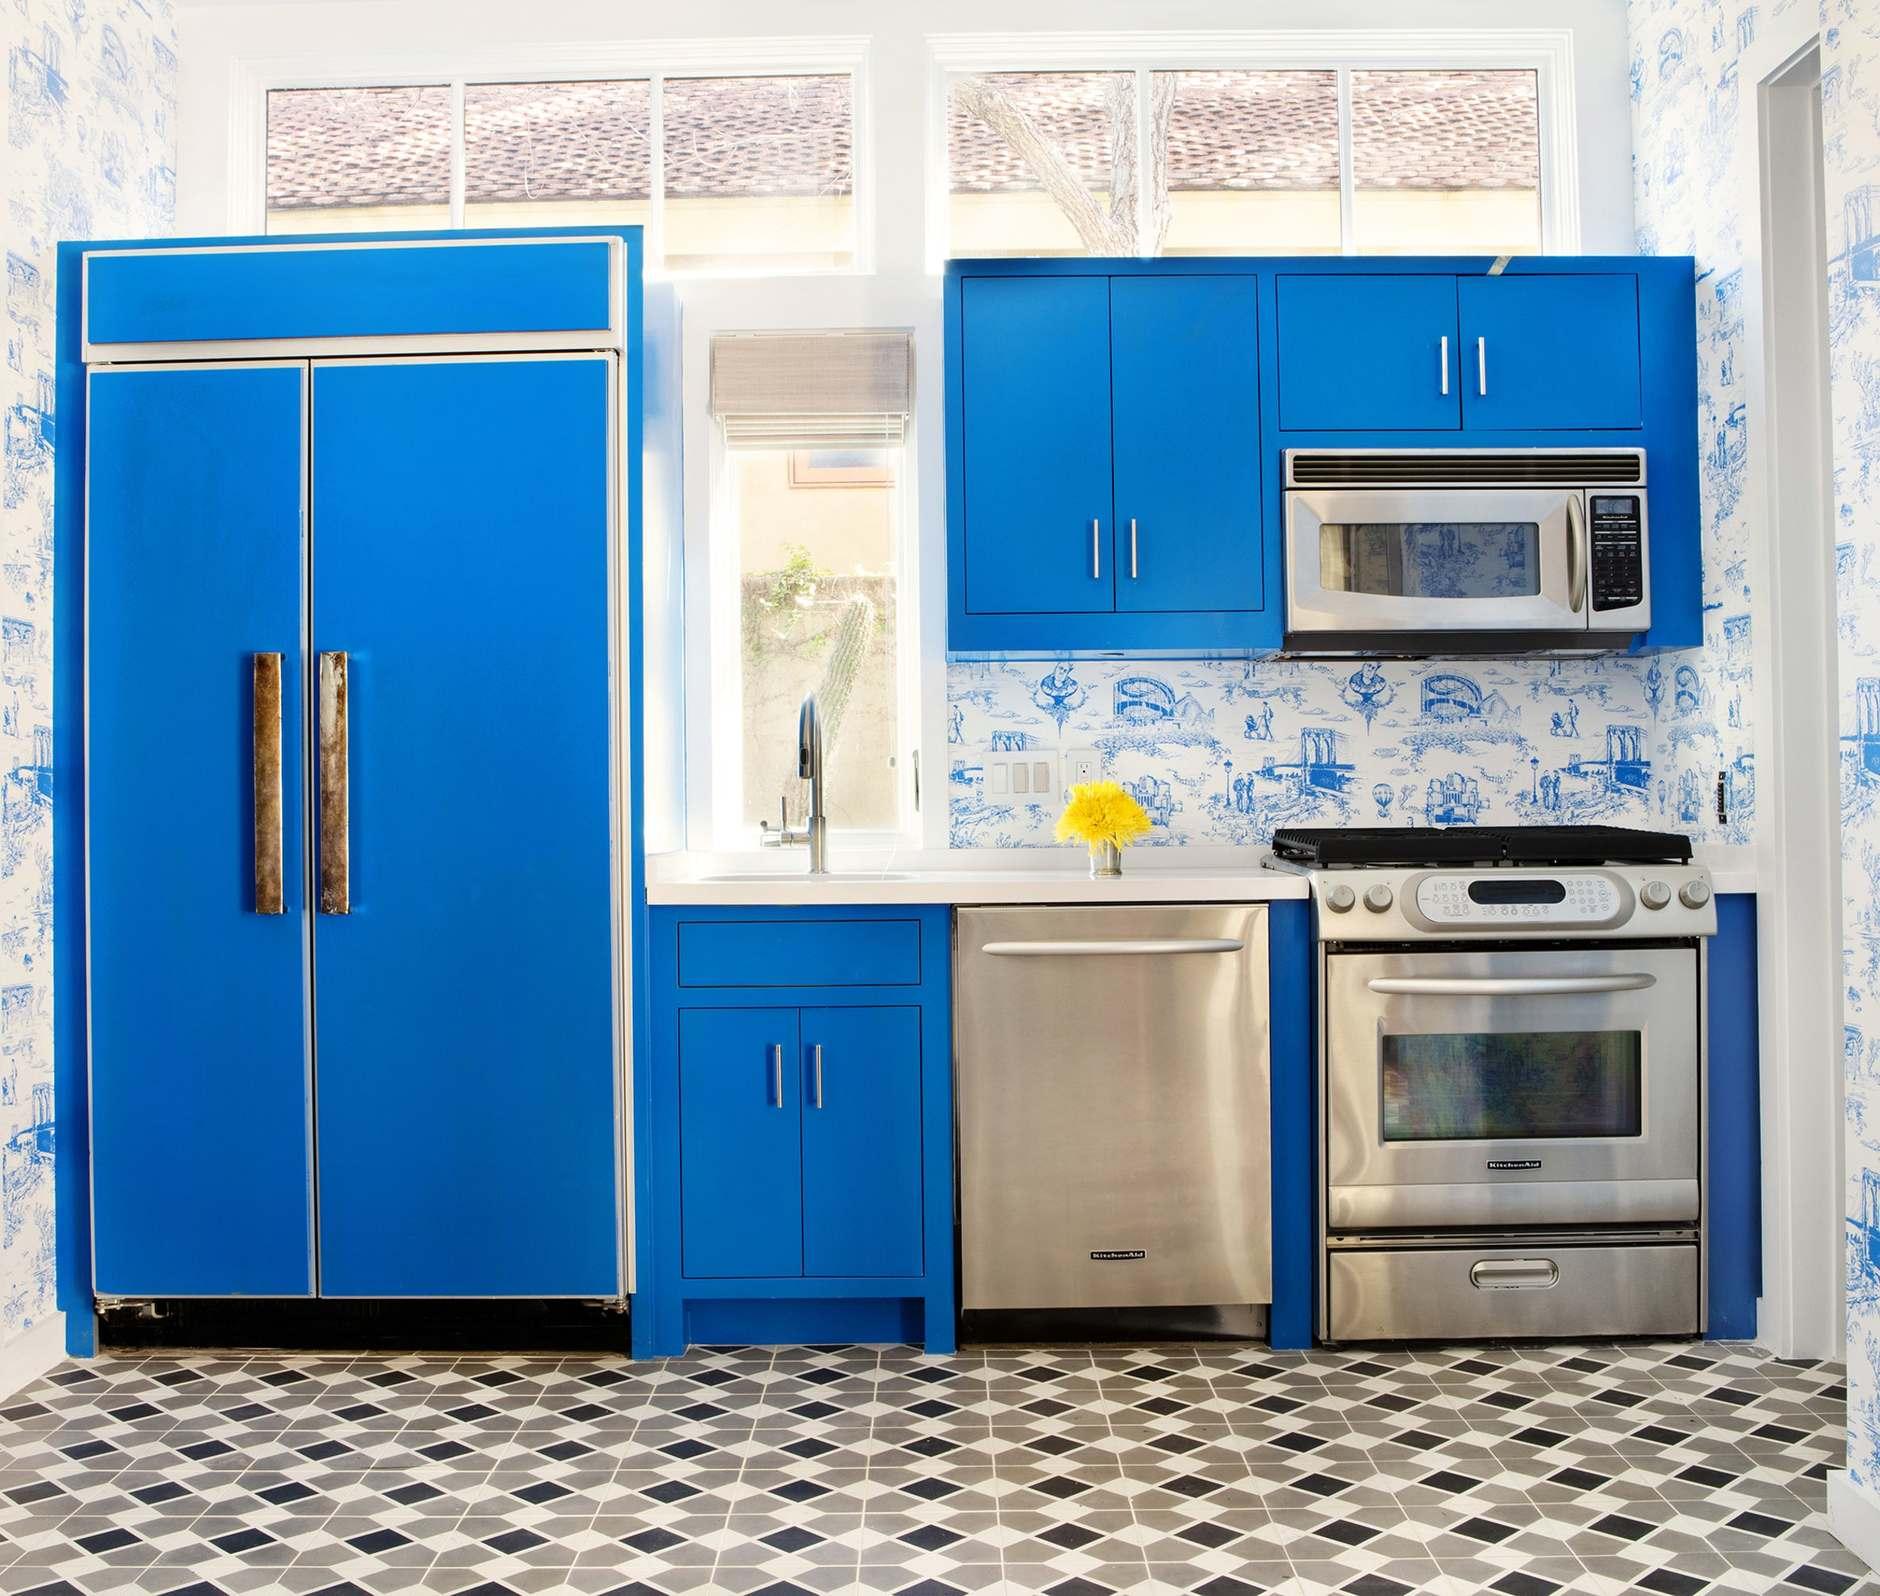 Обои на кухне: 10 свежих идей (галерея 0, фото 1)